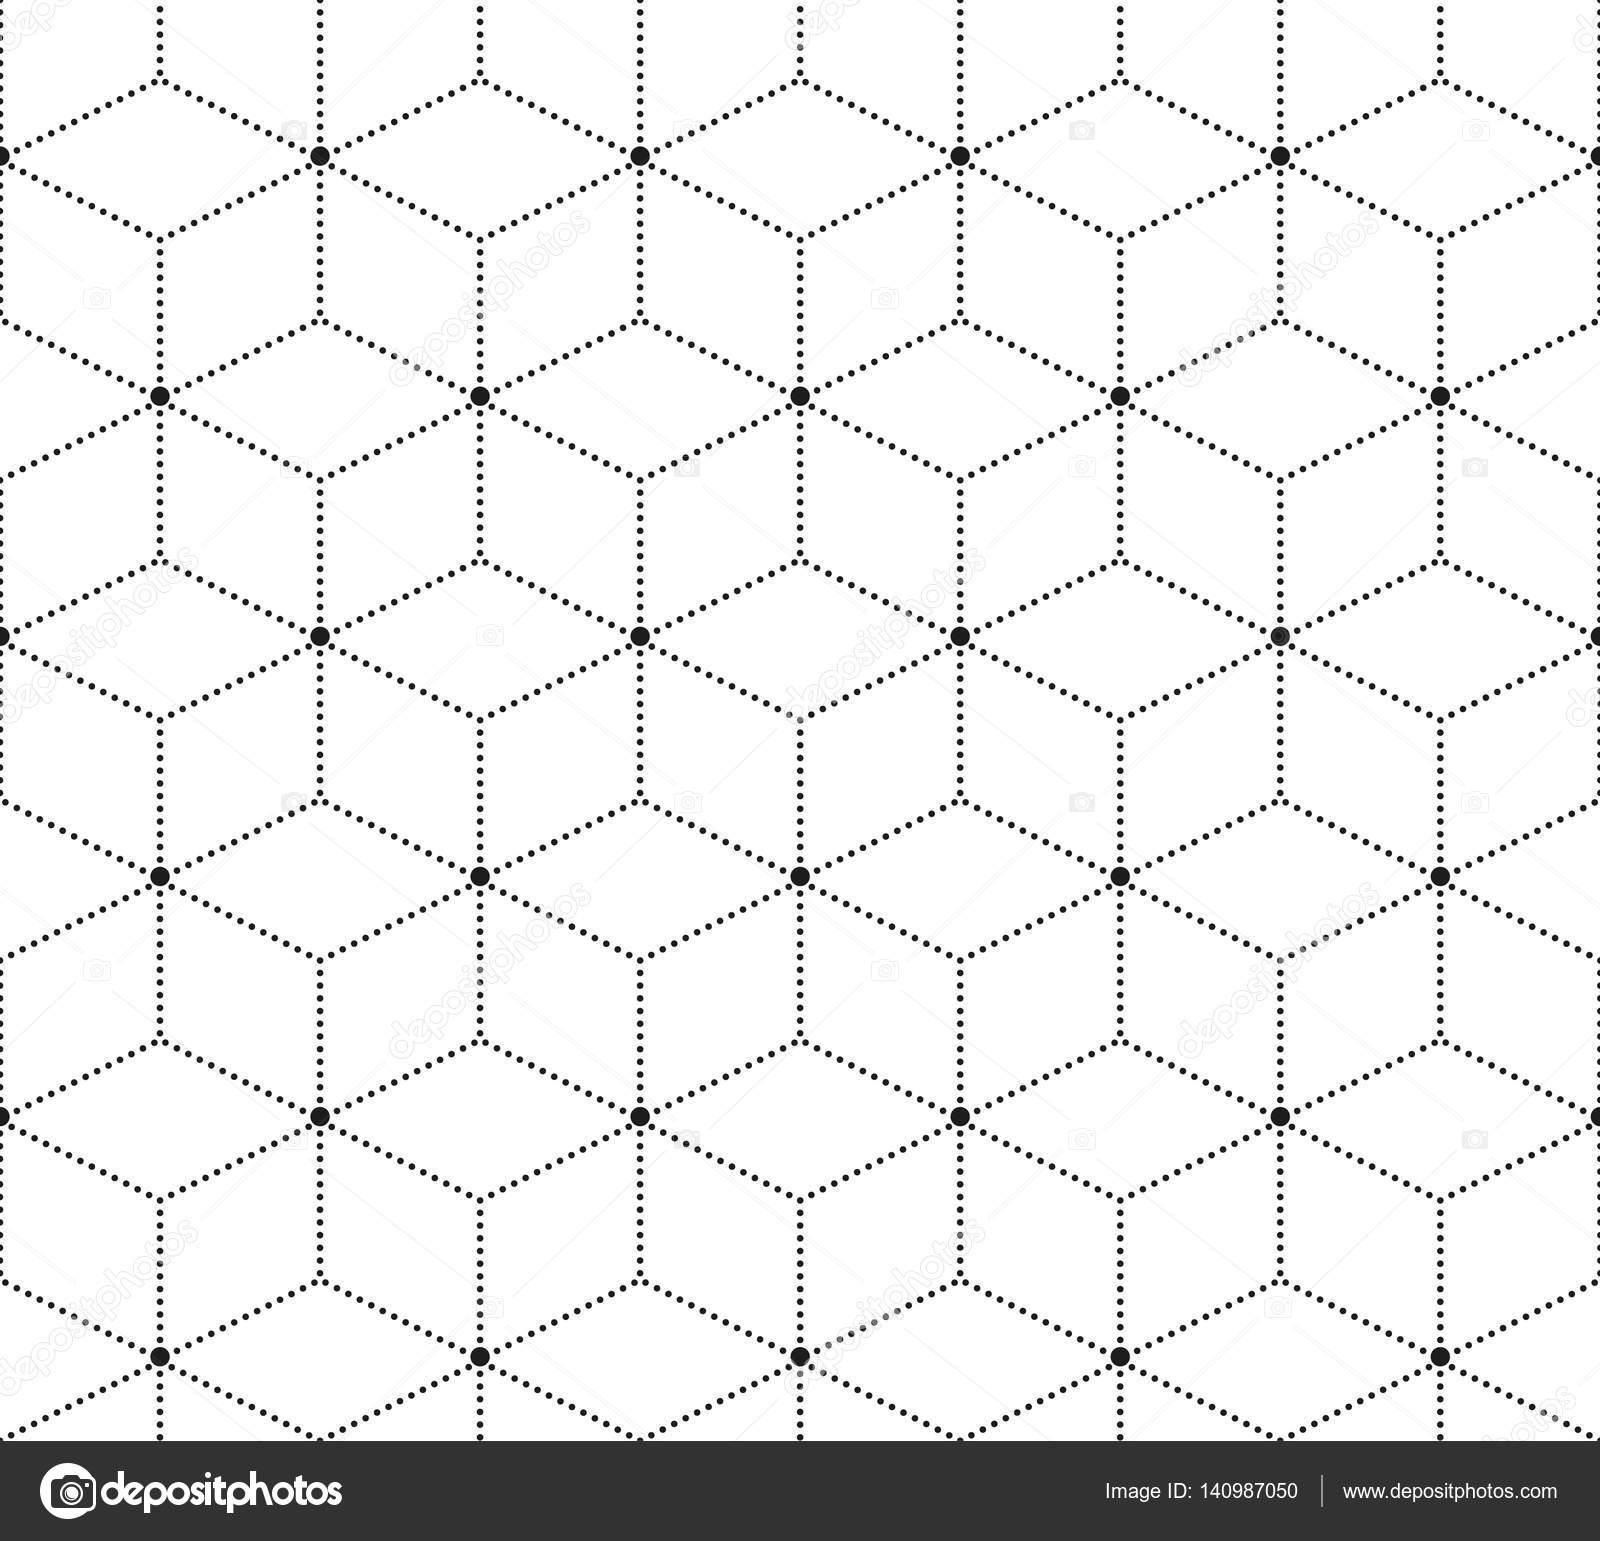 https depositphotos com 140987050 stock illustration black and white seamless pattern html